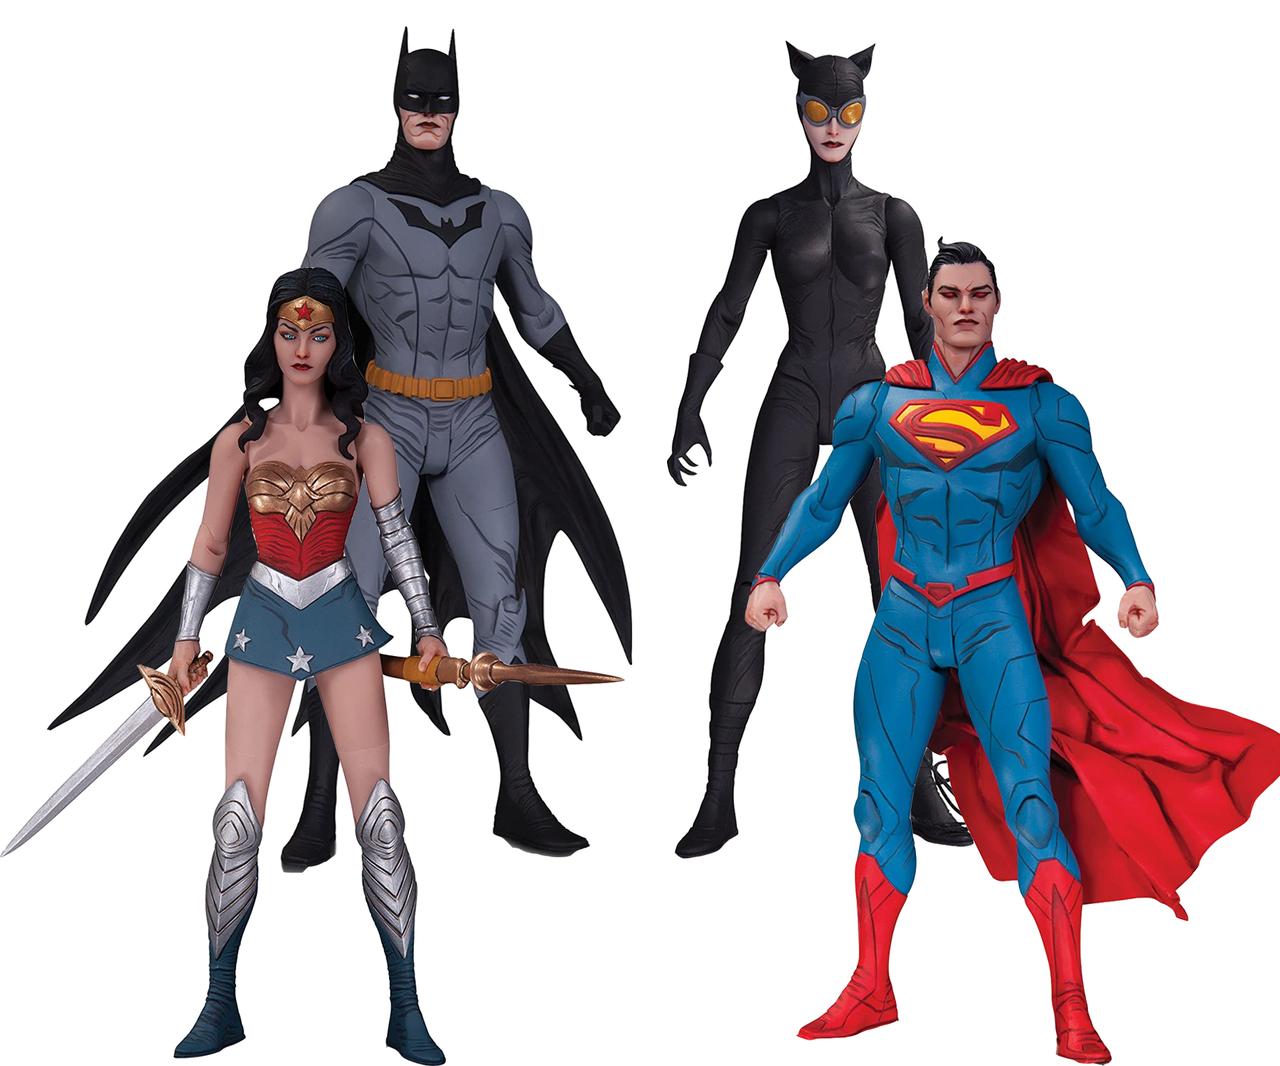 Набор фигурок DC Comics, Лига Справедливости, 17 см - Justice League, Designer Series By Jae Lee